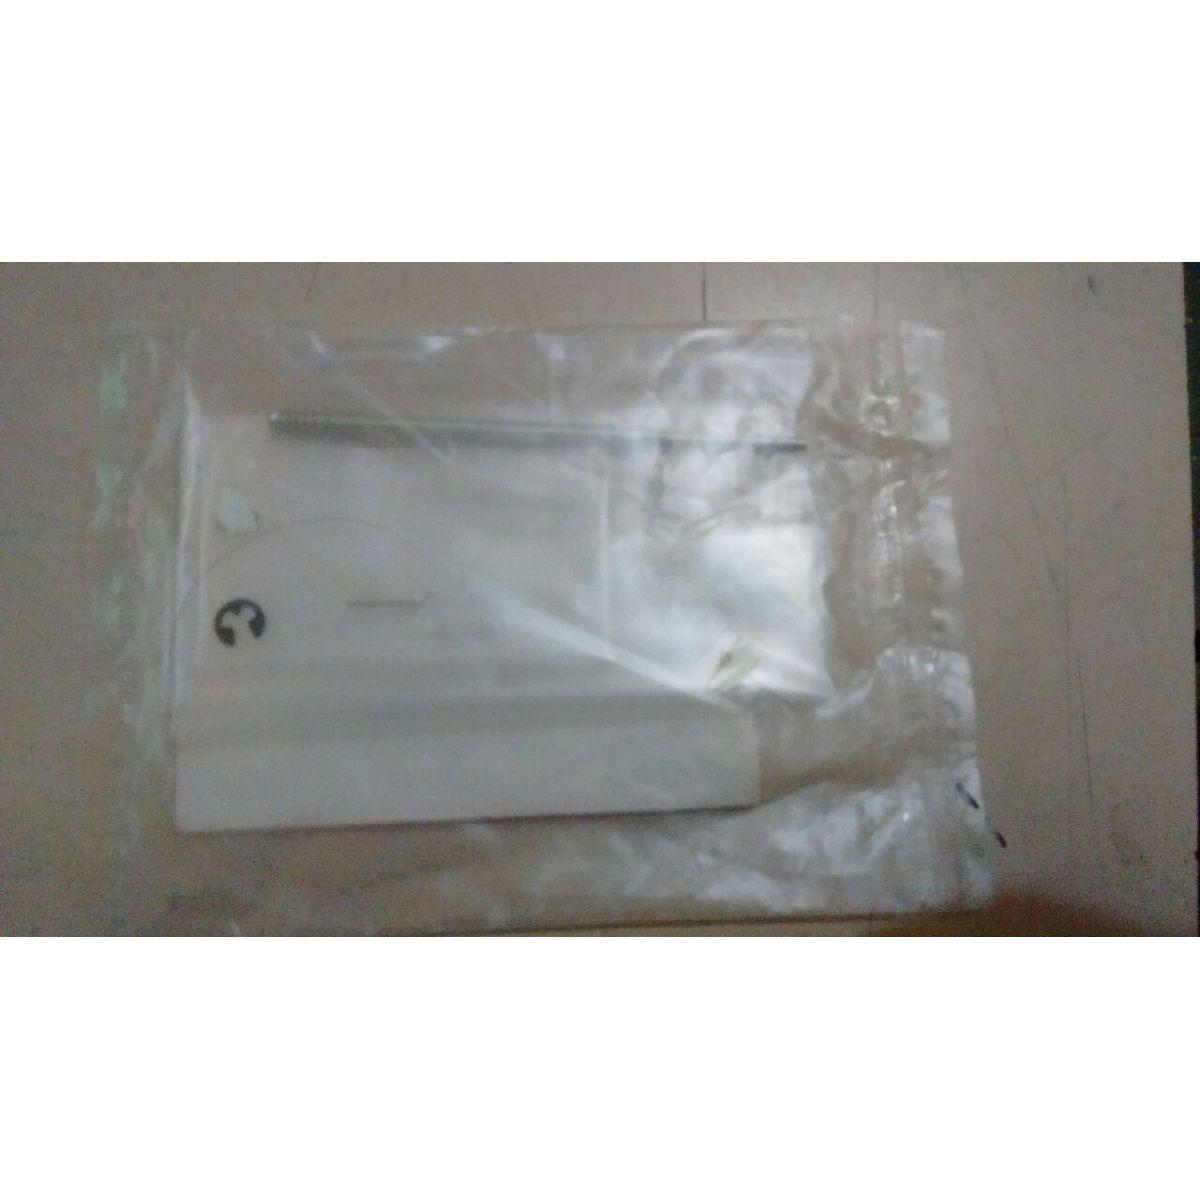 Agulha Pistonete TMX 16204-KZ3-L22 (6BEY30-74) CR250 2002  - T & T Soluções